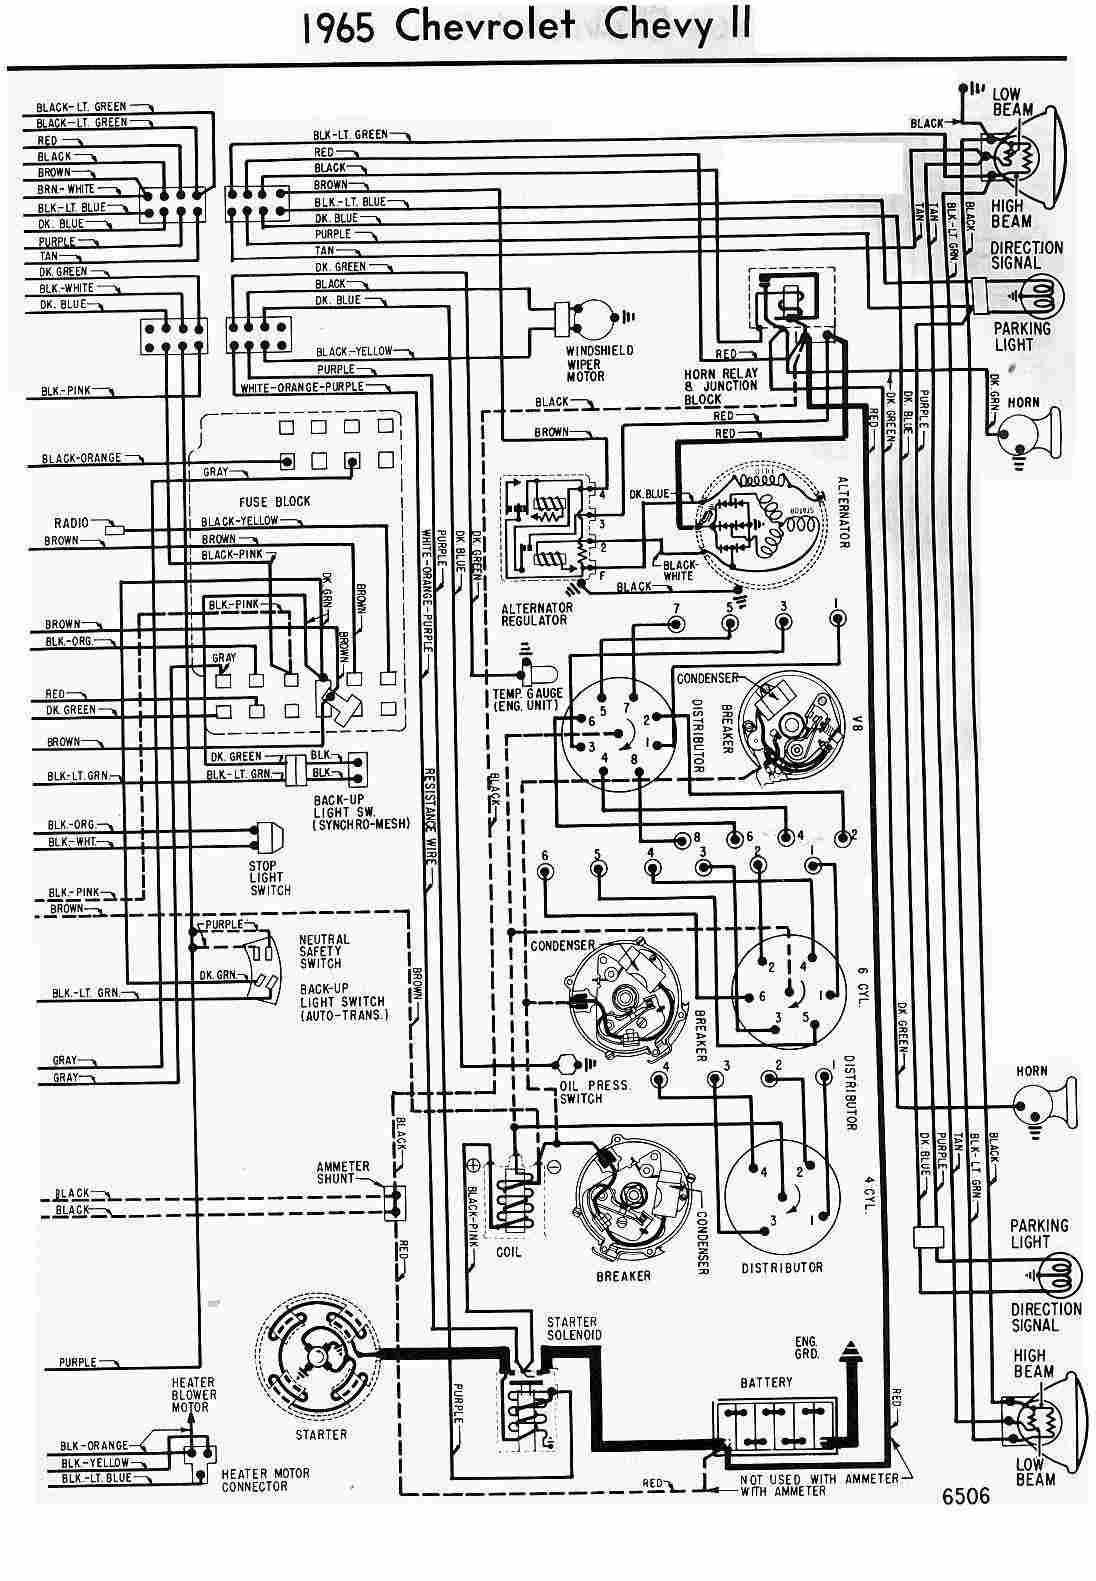 75 chevy caprice wiring diagram schematic wiring diagram library 75 chevy malibu 1976 corvette dash wiring diagram schematic simple wiring diagrams 75 chevy caprice